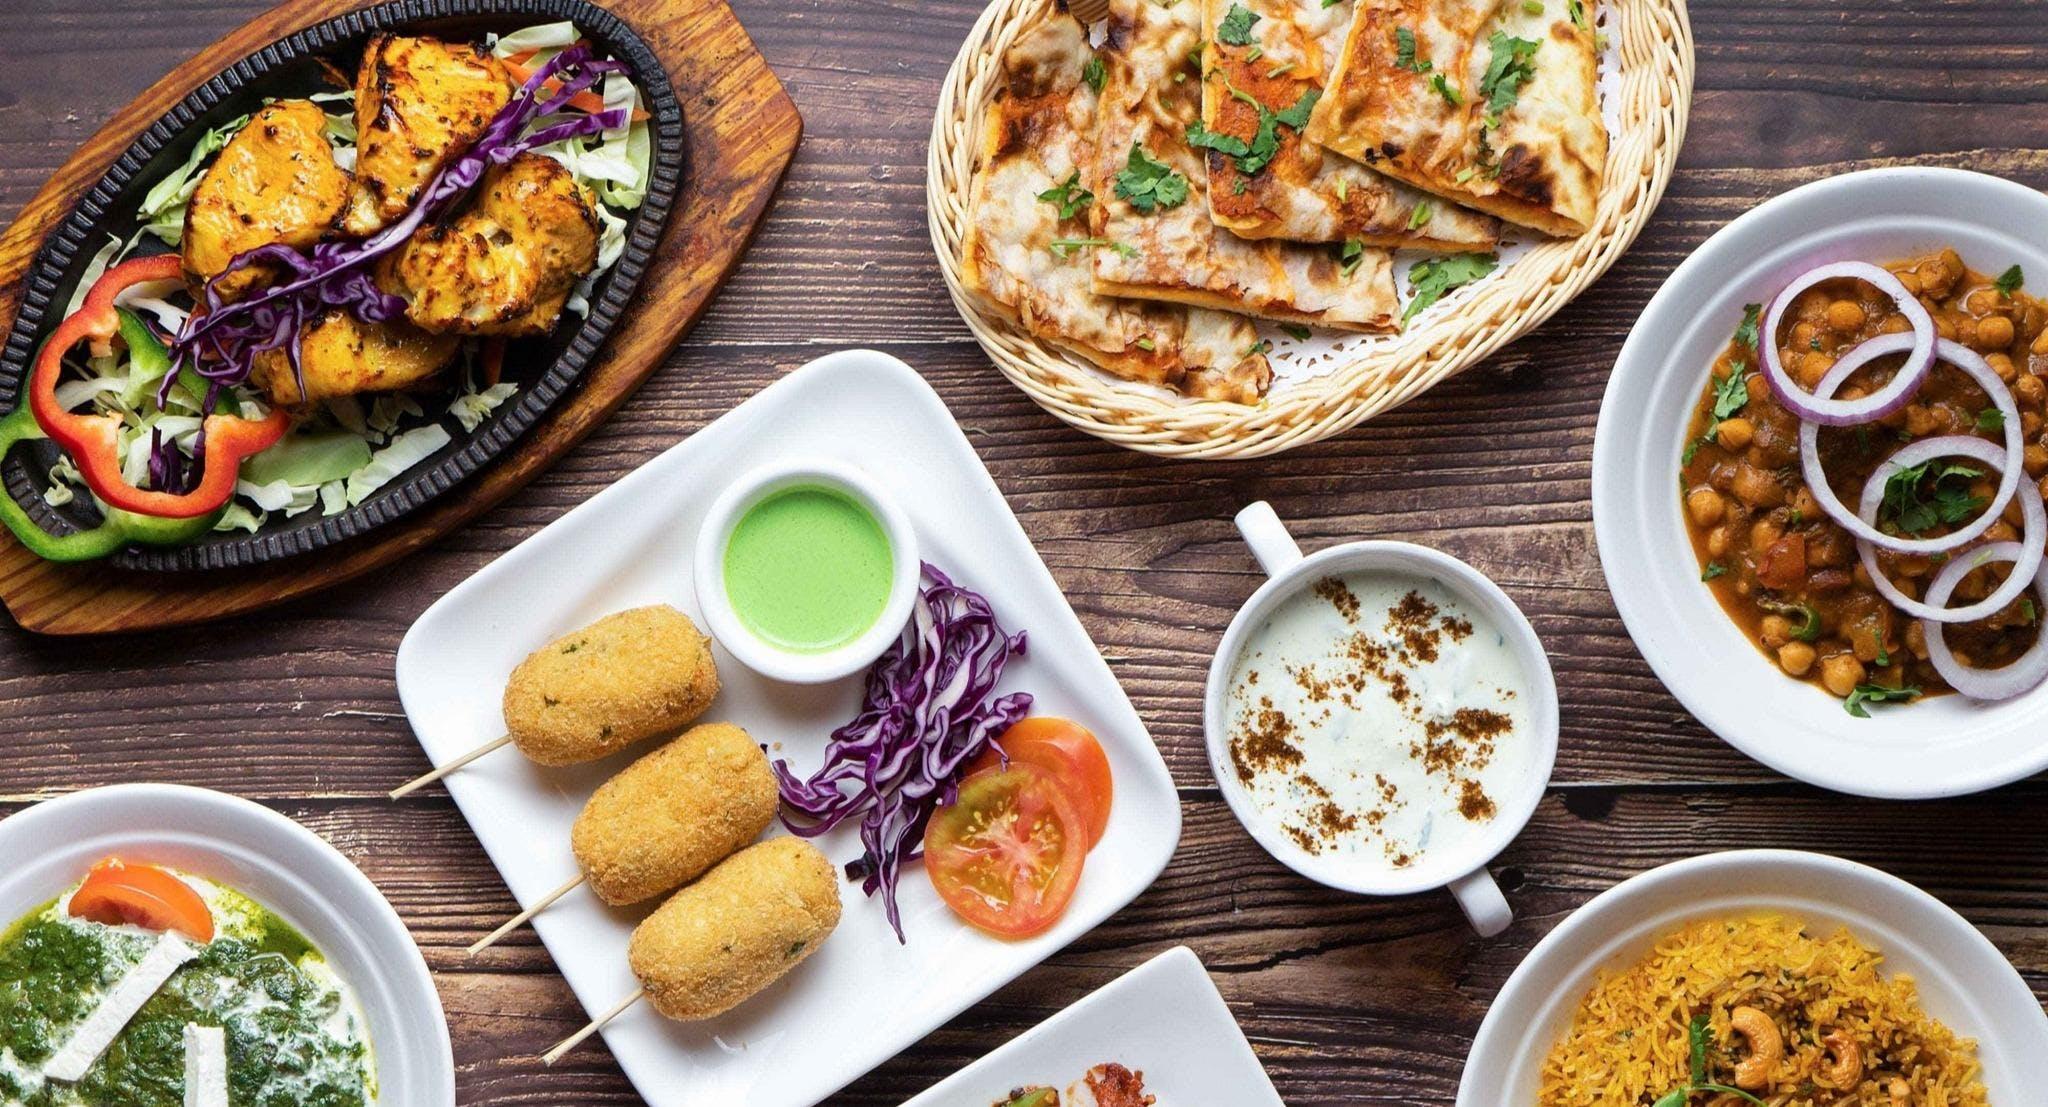 Curry Leaf Indian Cuisine